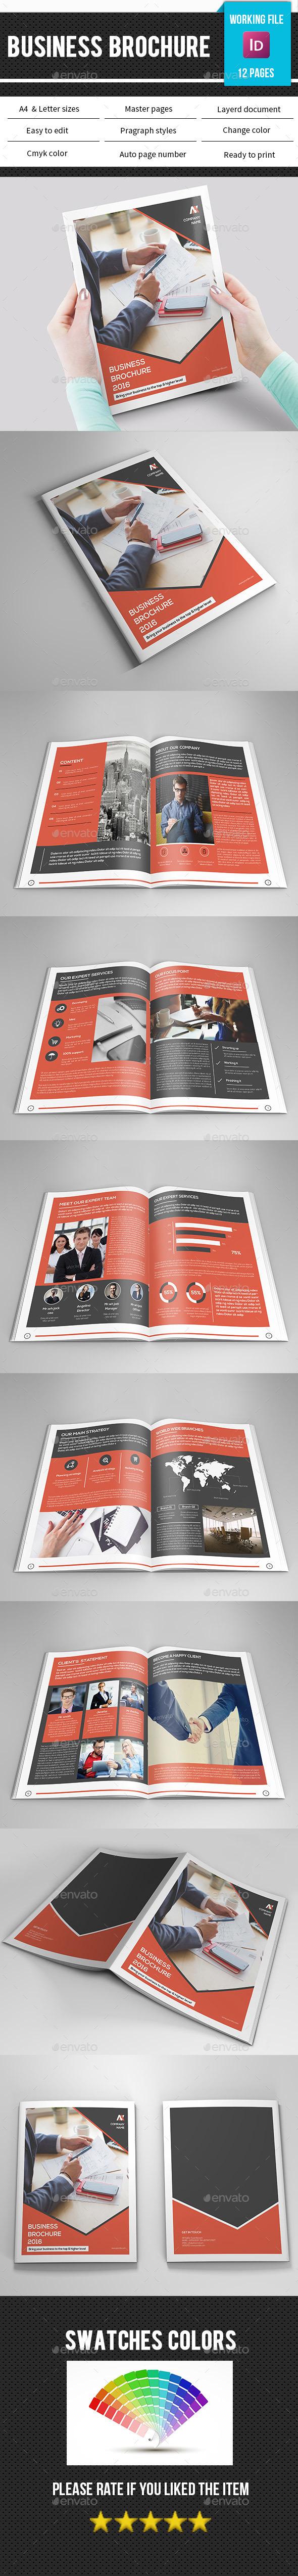 Corporate Brochure Template-V376 - Corporate Brochures